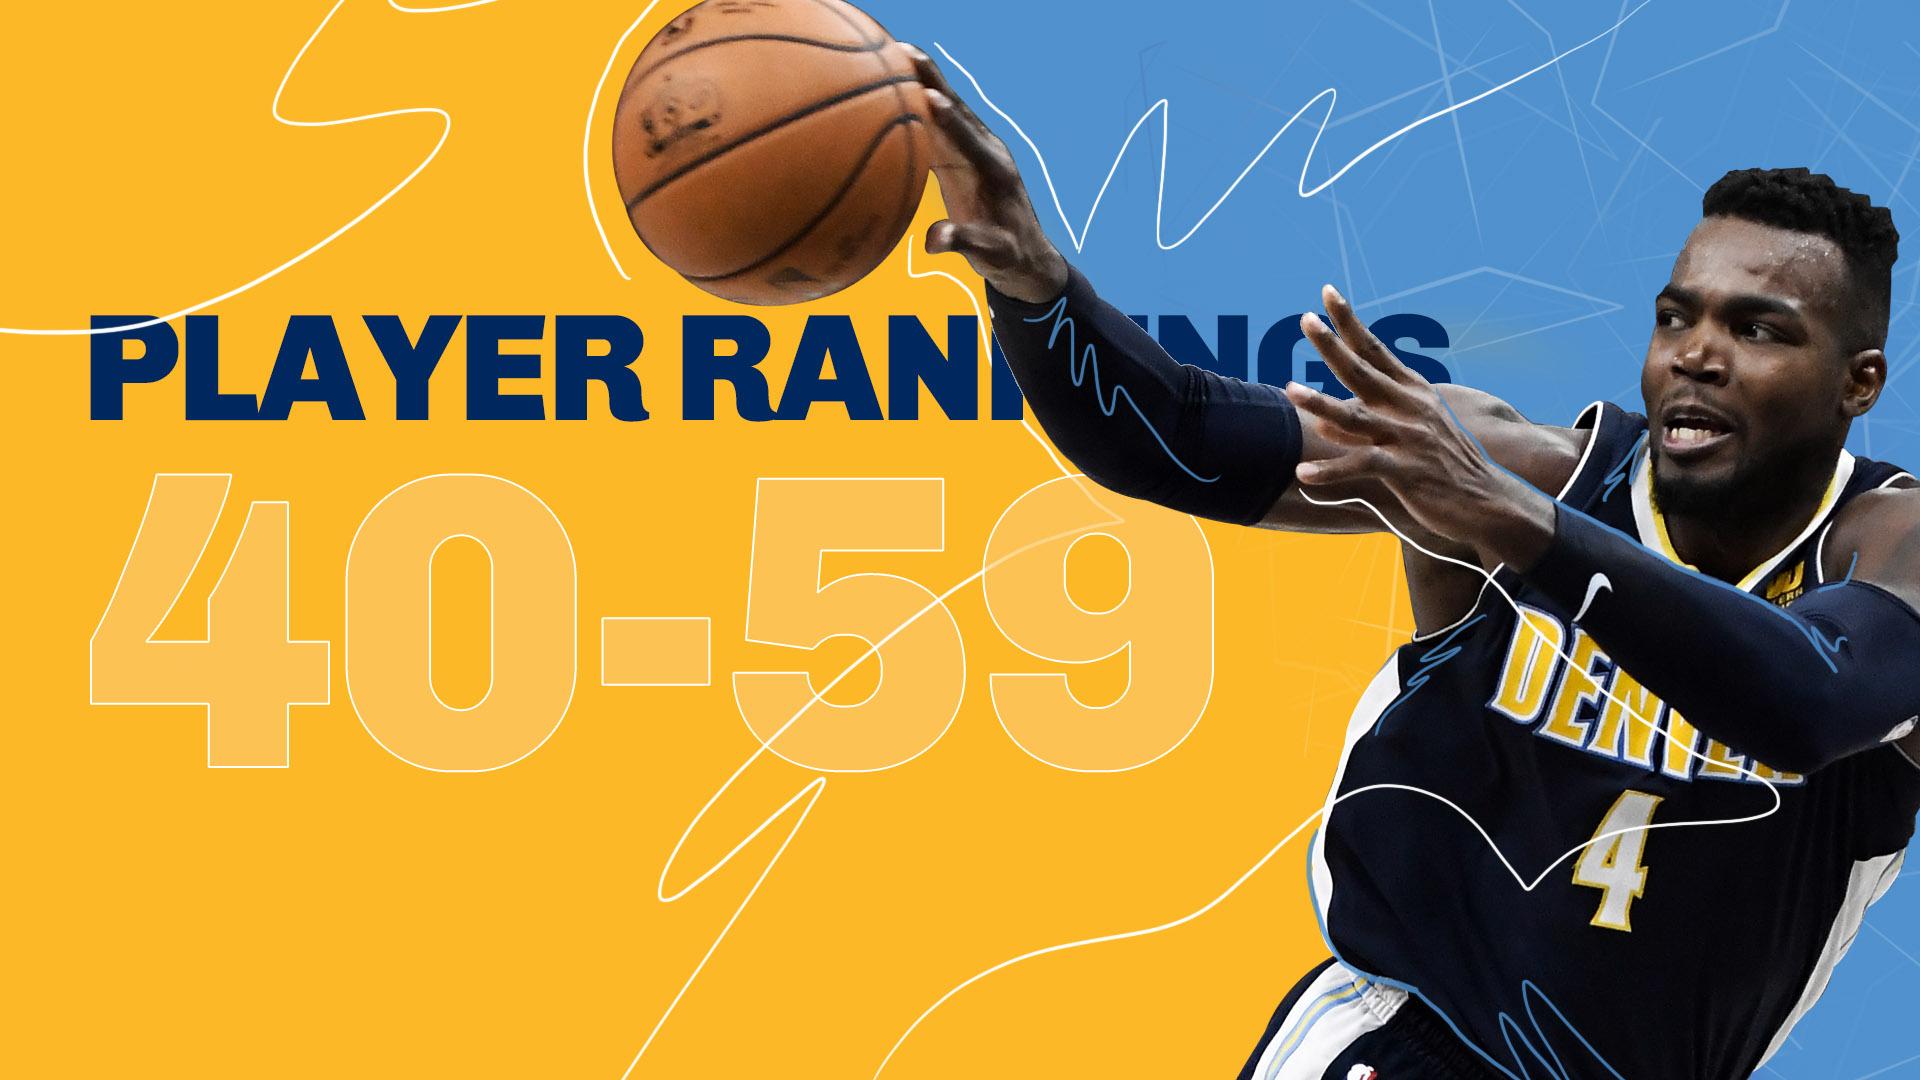 d8cbf123a10 Sporting News' NBA Top 100: Ranking basketball's best players (40-59) |  Sporting News